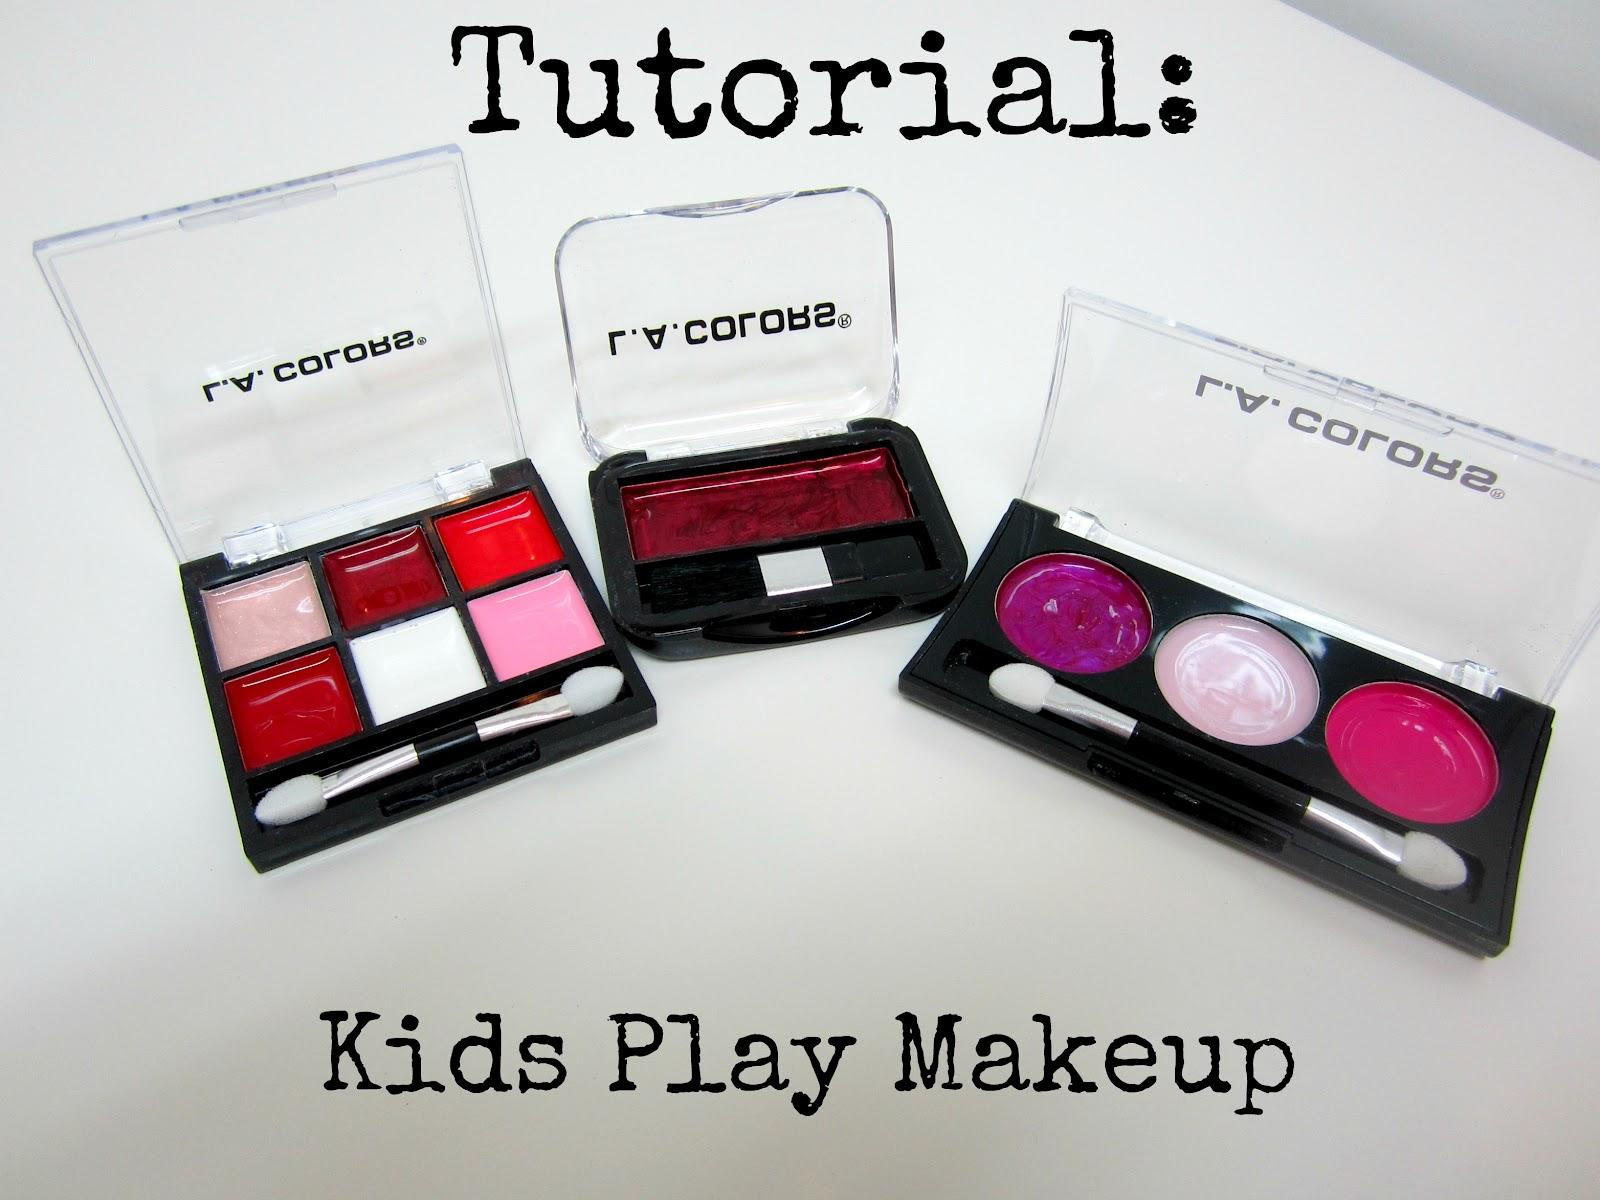 4Eighteen: Tutorial: Kids Play Makeup